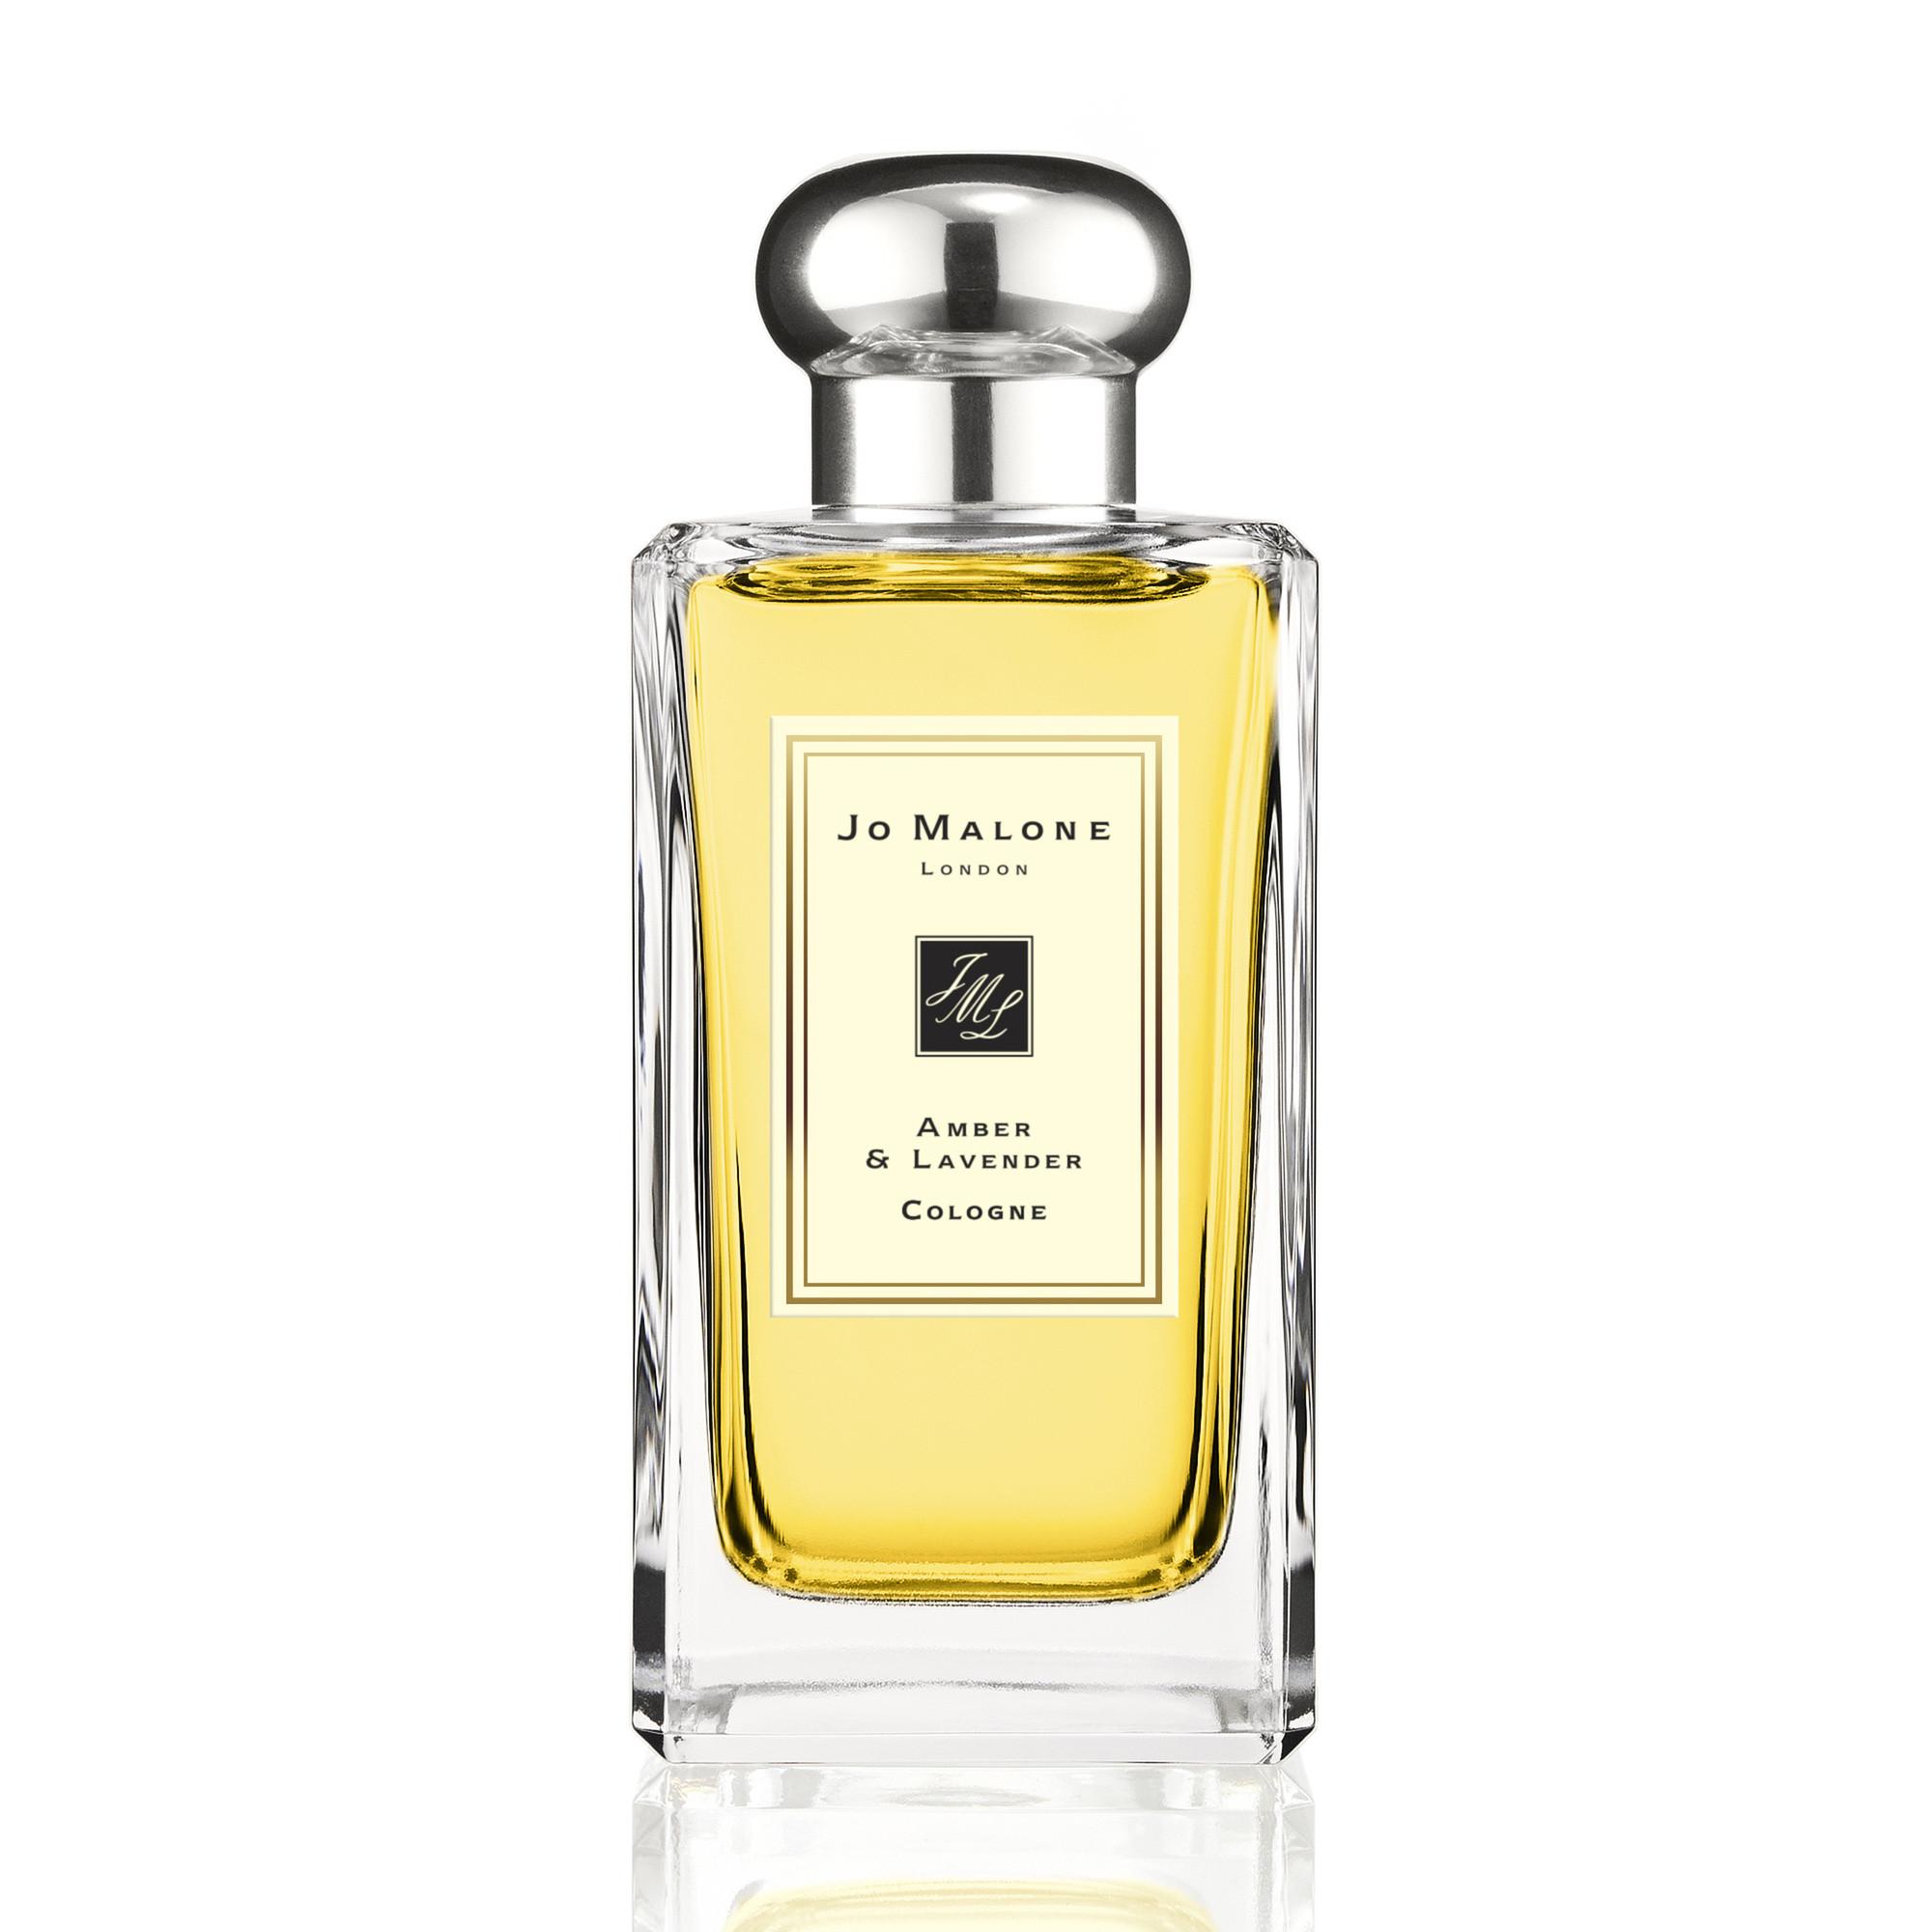 Jo Malone London amber & lavender cologne 100 ml, Beige, large image number 0